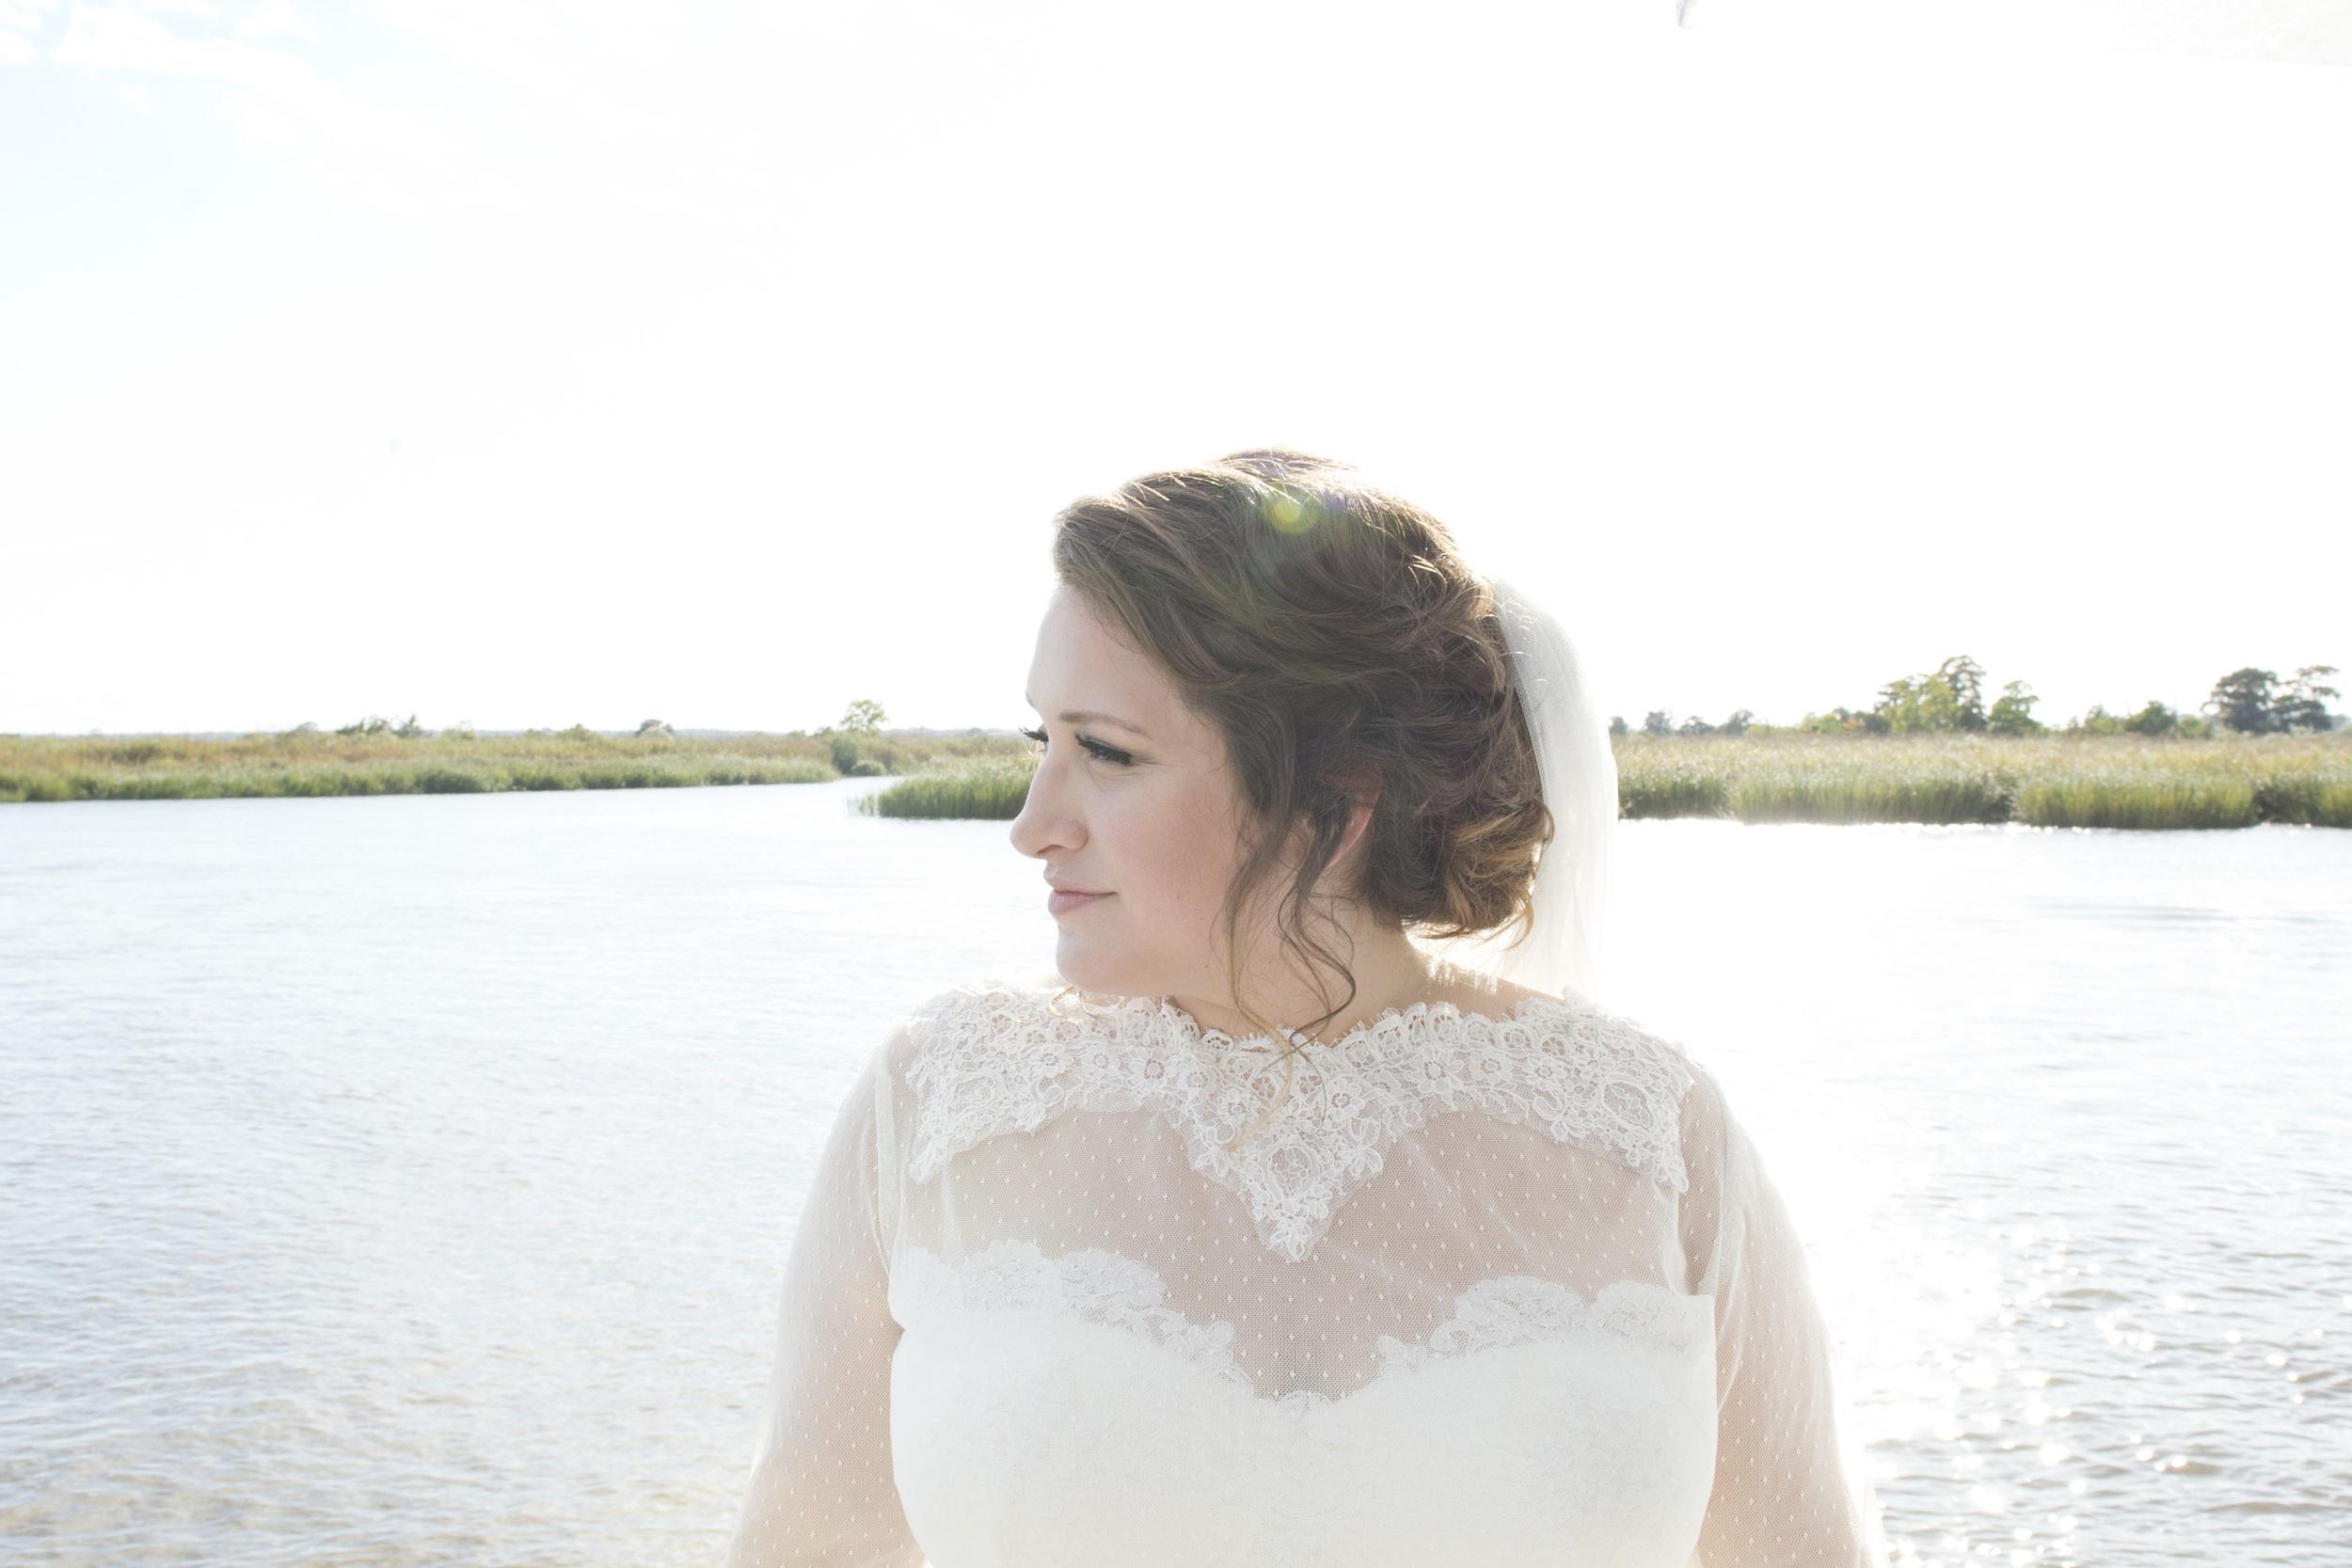 Caroline-Kilgore-photography-ivory-and-beau-bridal-boutique-savannah-wedding-dresses-savannah-bridal-boutique-savannah-wedding-gowns-custom-wedding-dress-vintage-wedding-dress-swiss-dot-wedding-dress-shrimp-boat-wedding-4.jpg